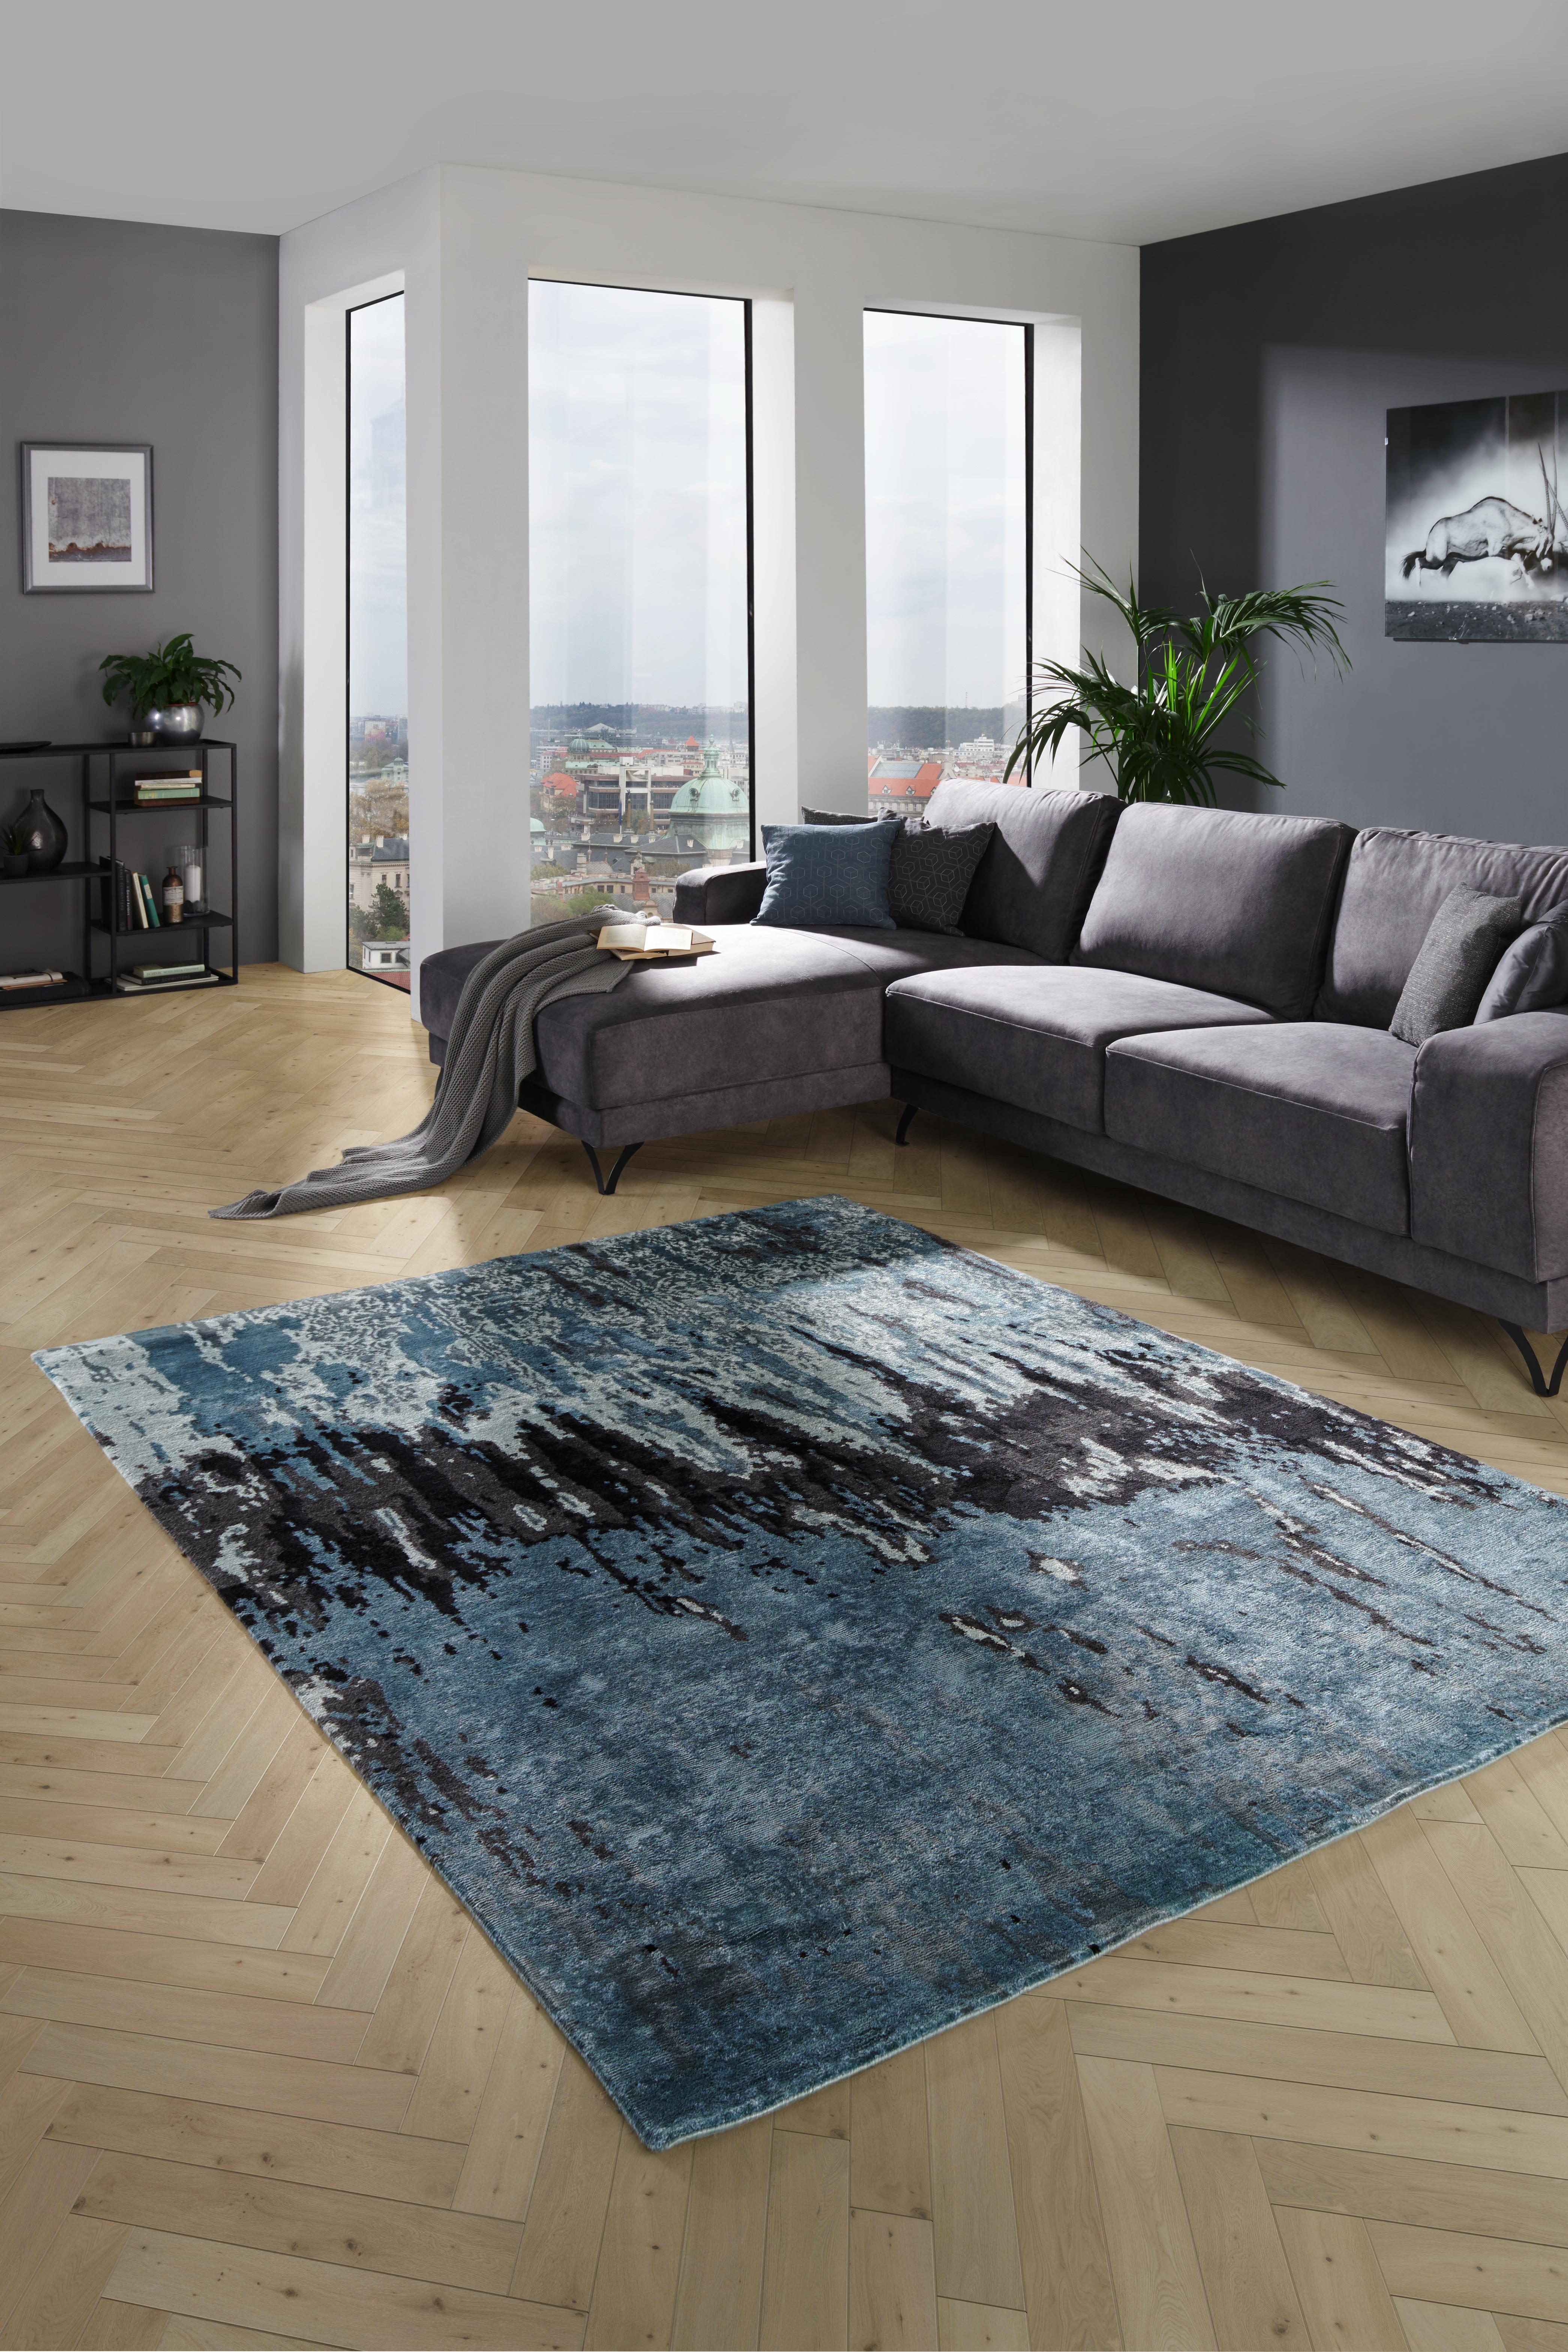 ORIENTALISK MATTA 140/200 cm  - turkos, Design, textil (140/200cm) - Esposa